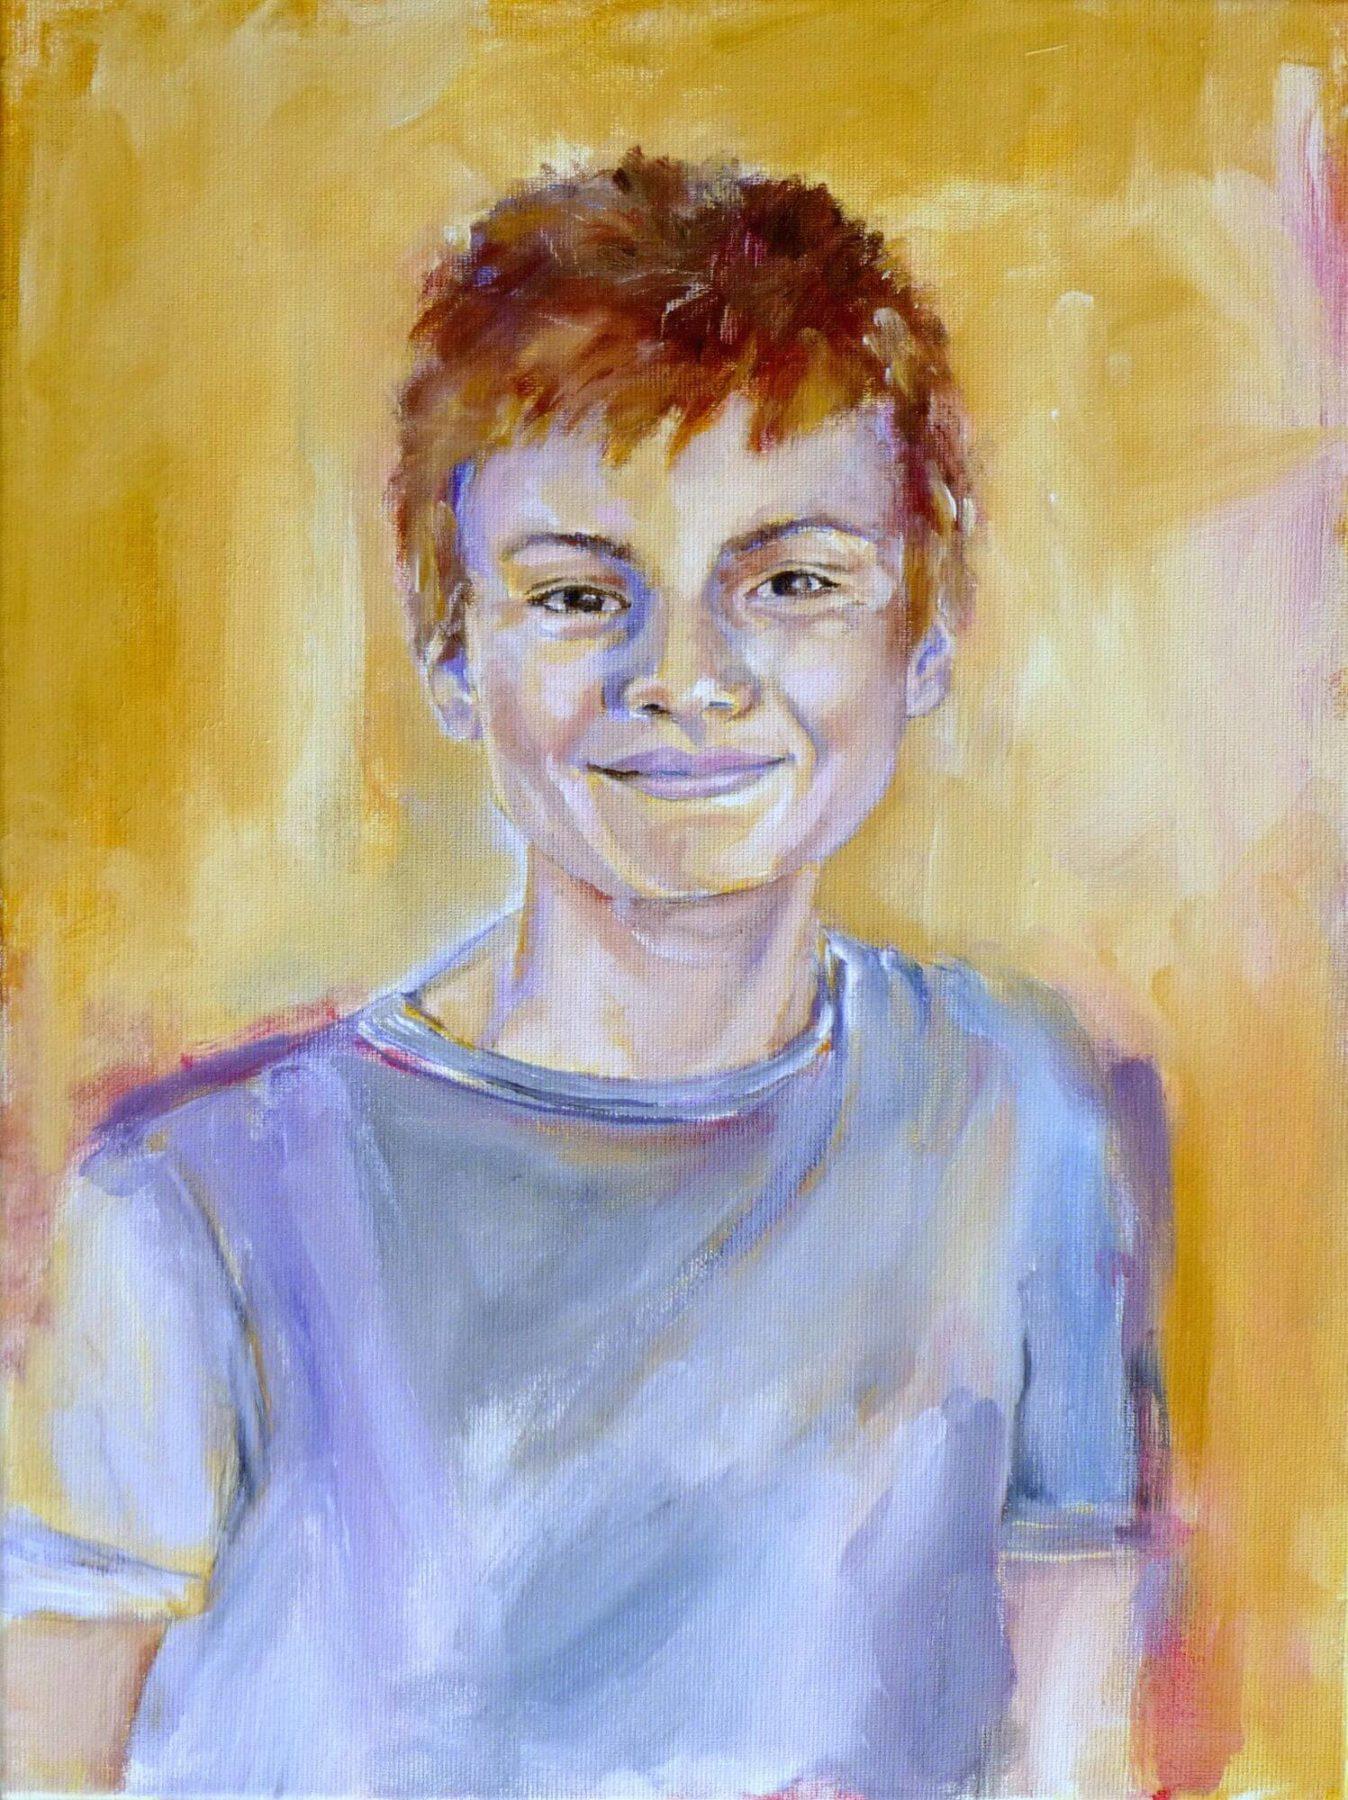 Flynn - painting, acrylic on canvas by artist Neva Bergemann